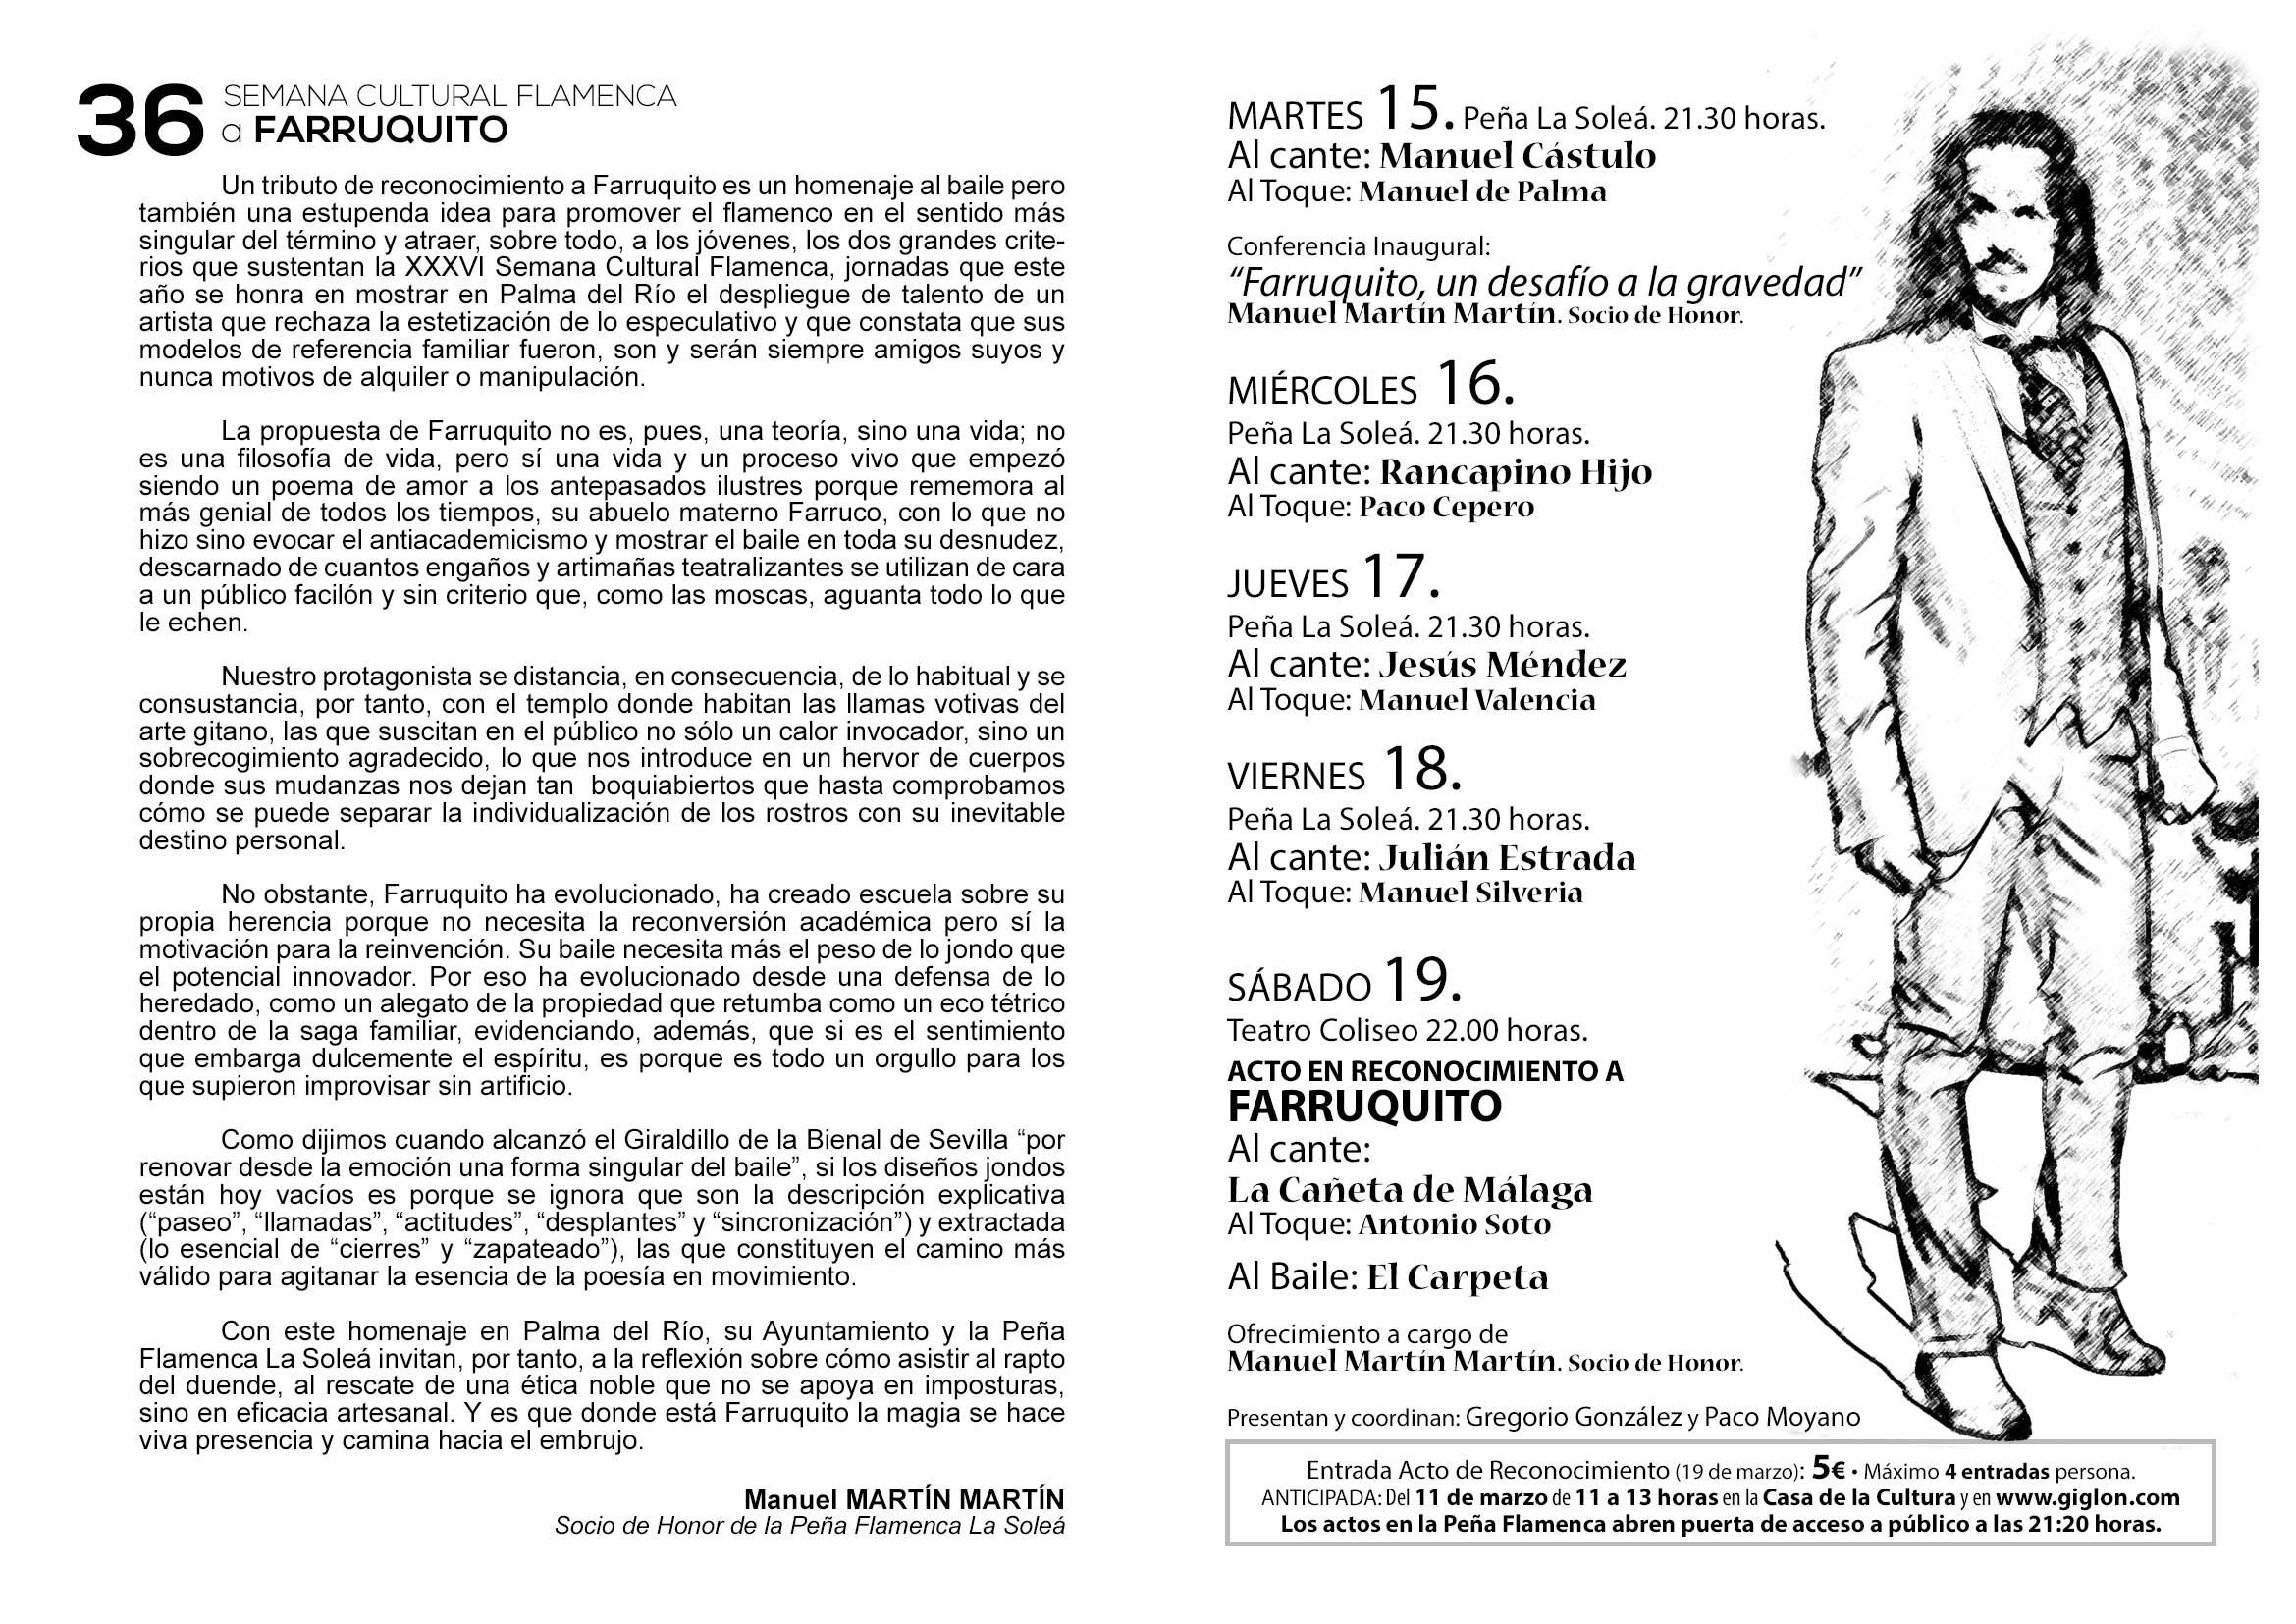 https://www.palmadelrio.es/sites/default/files/programa-interior-flamenco-2016.jpg